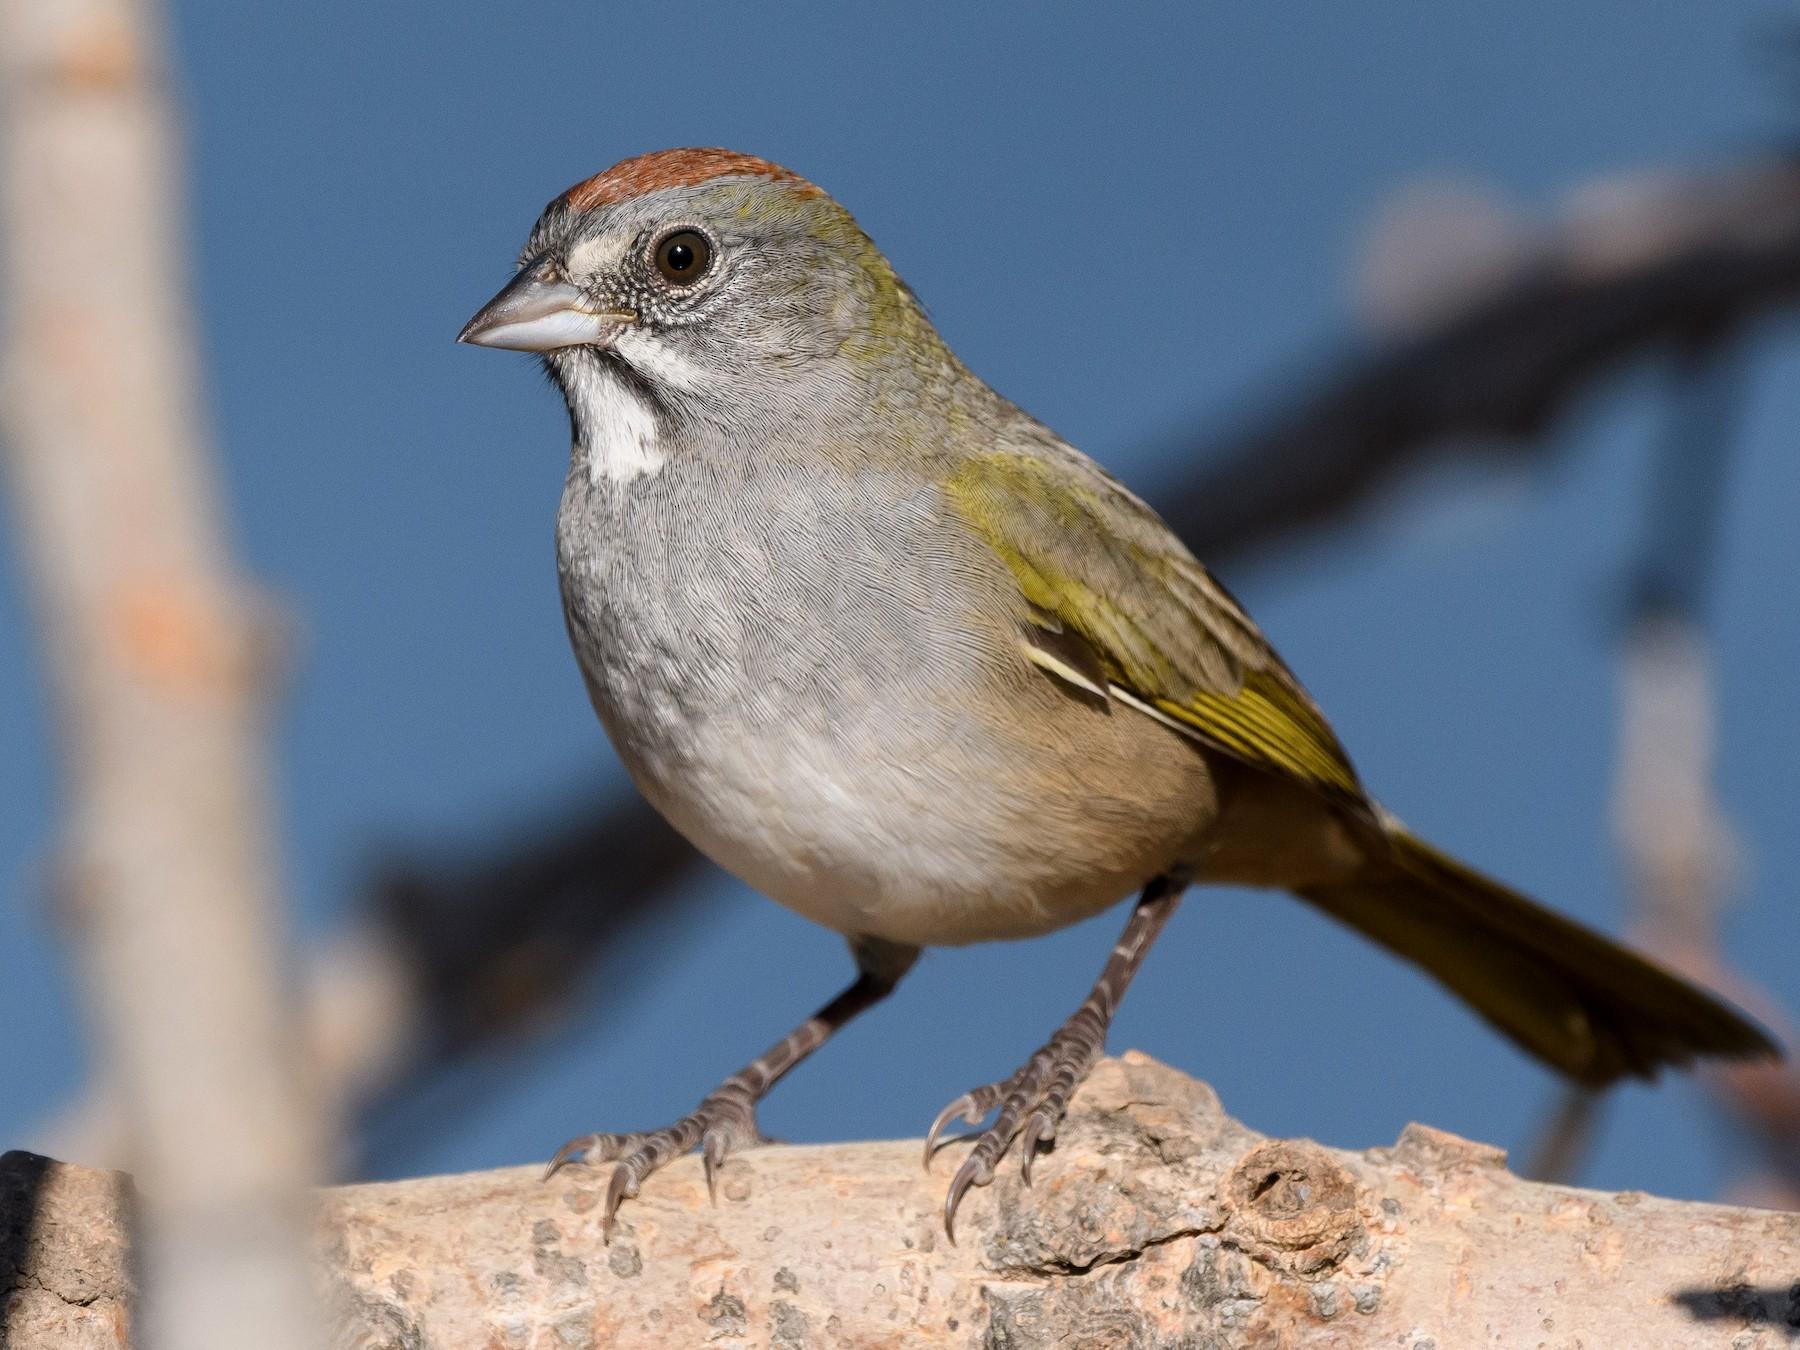 Green-tailed Towhee - Darren Clark